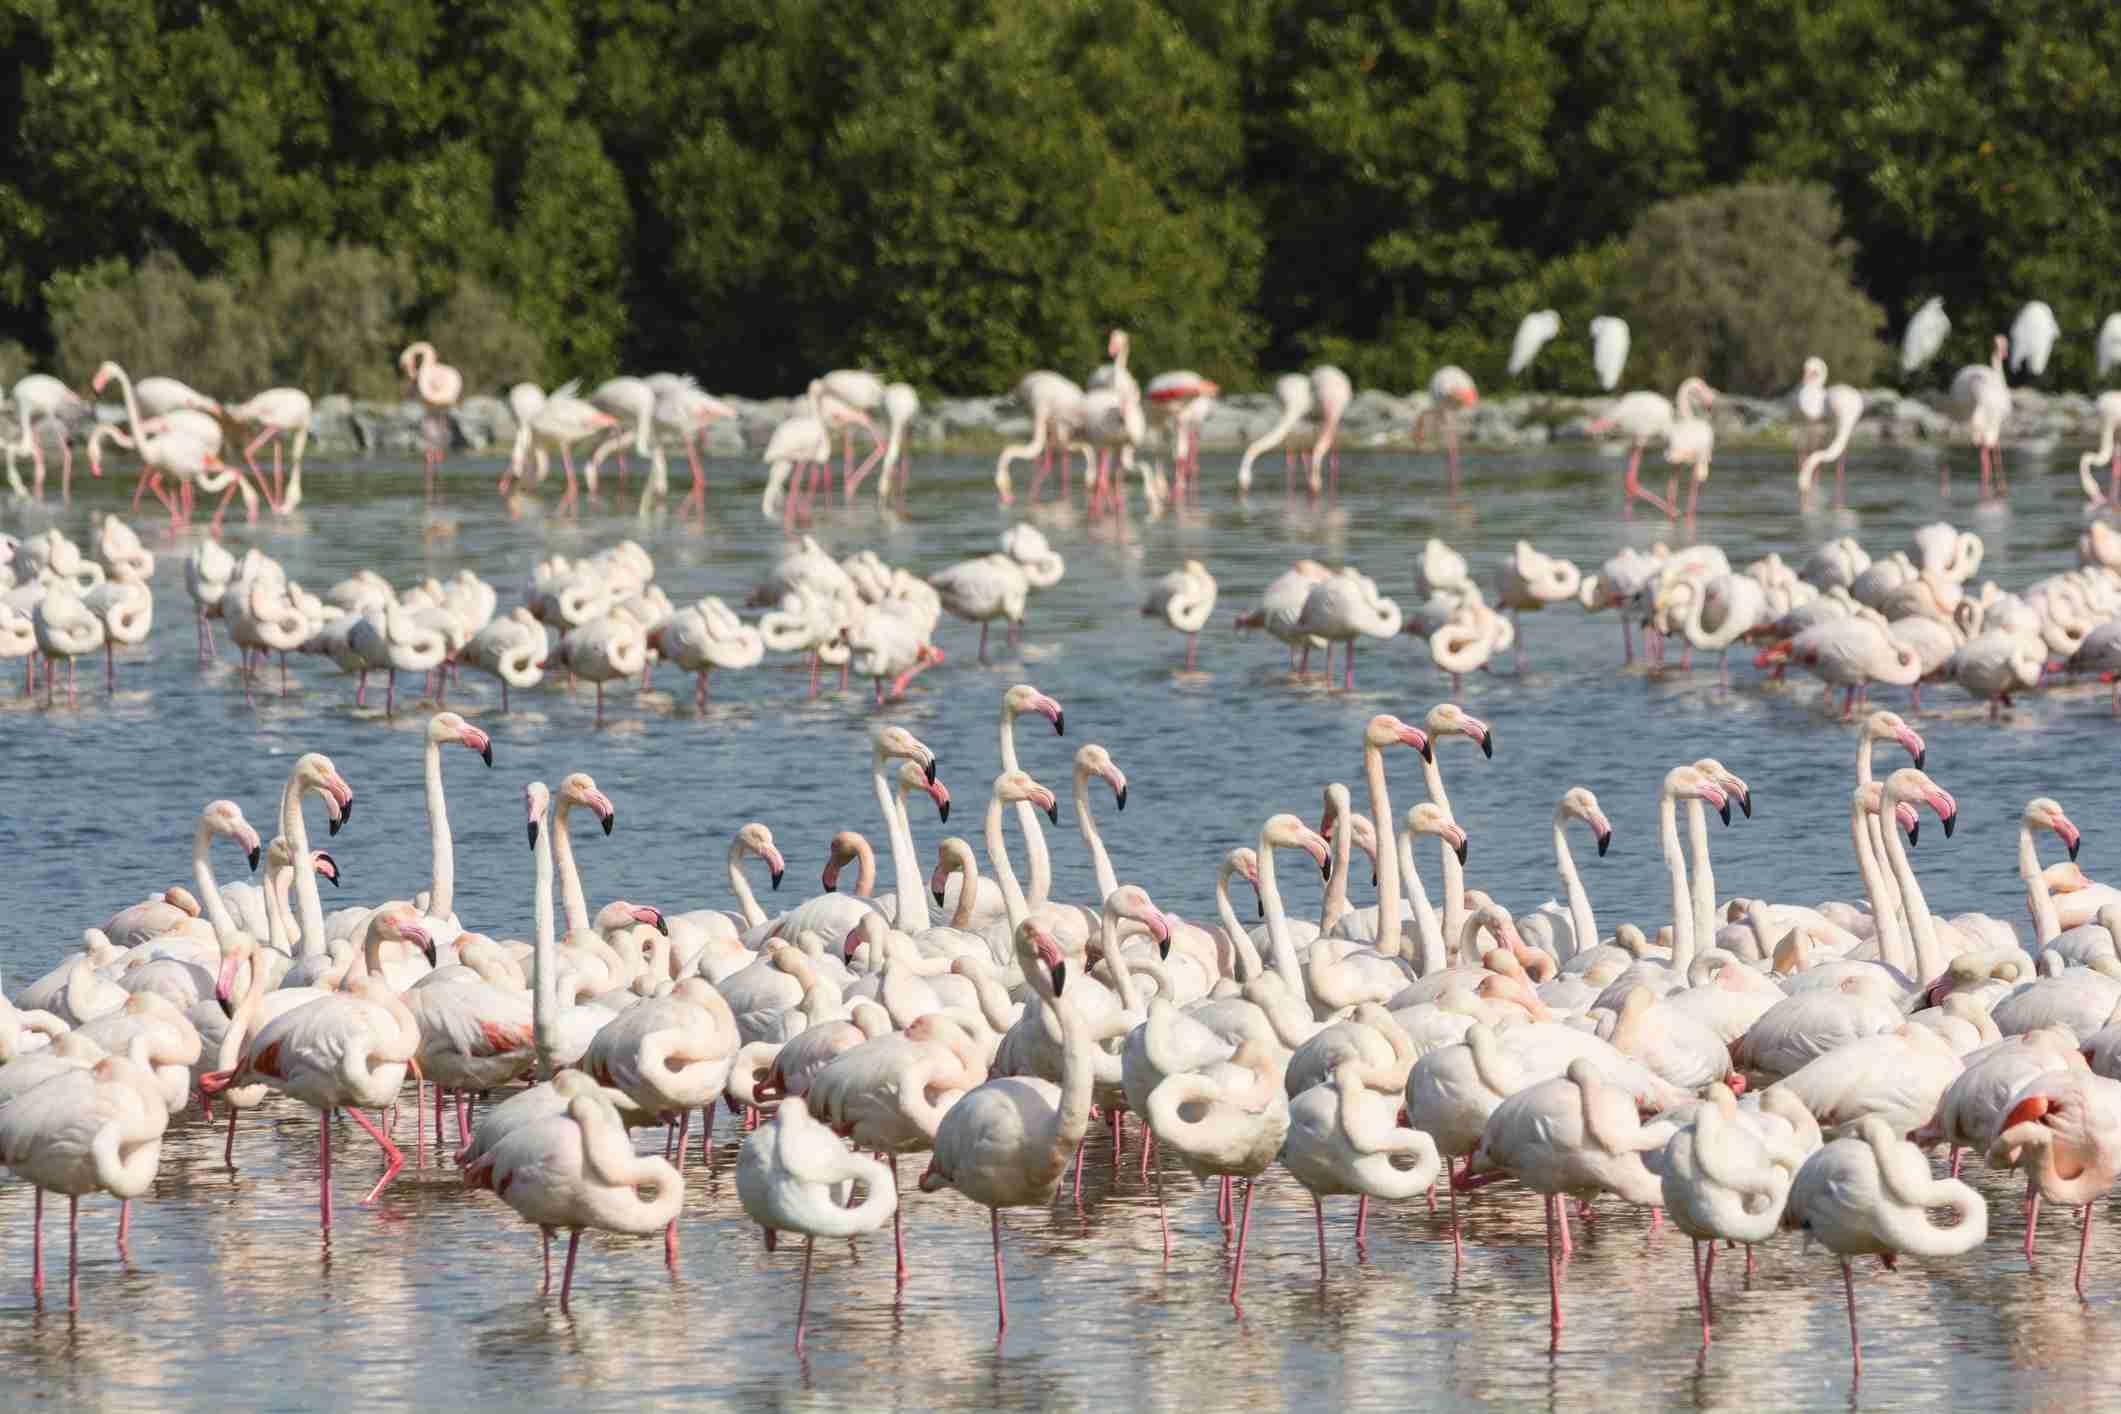 Pink flamingos at Ras al Khor wildlife bird sanctuary and wetlands in Dubai, United Arab Emirates.